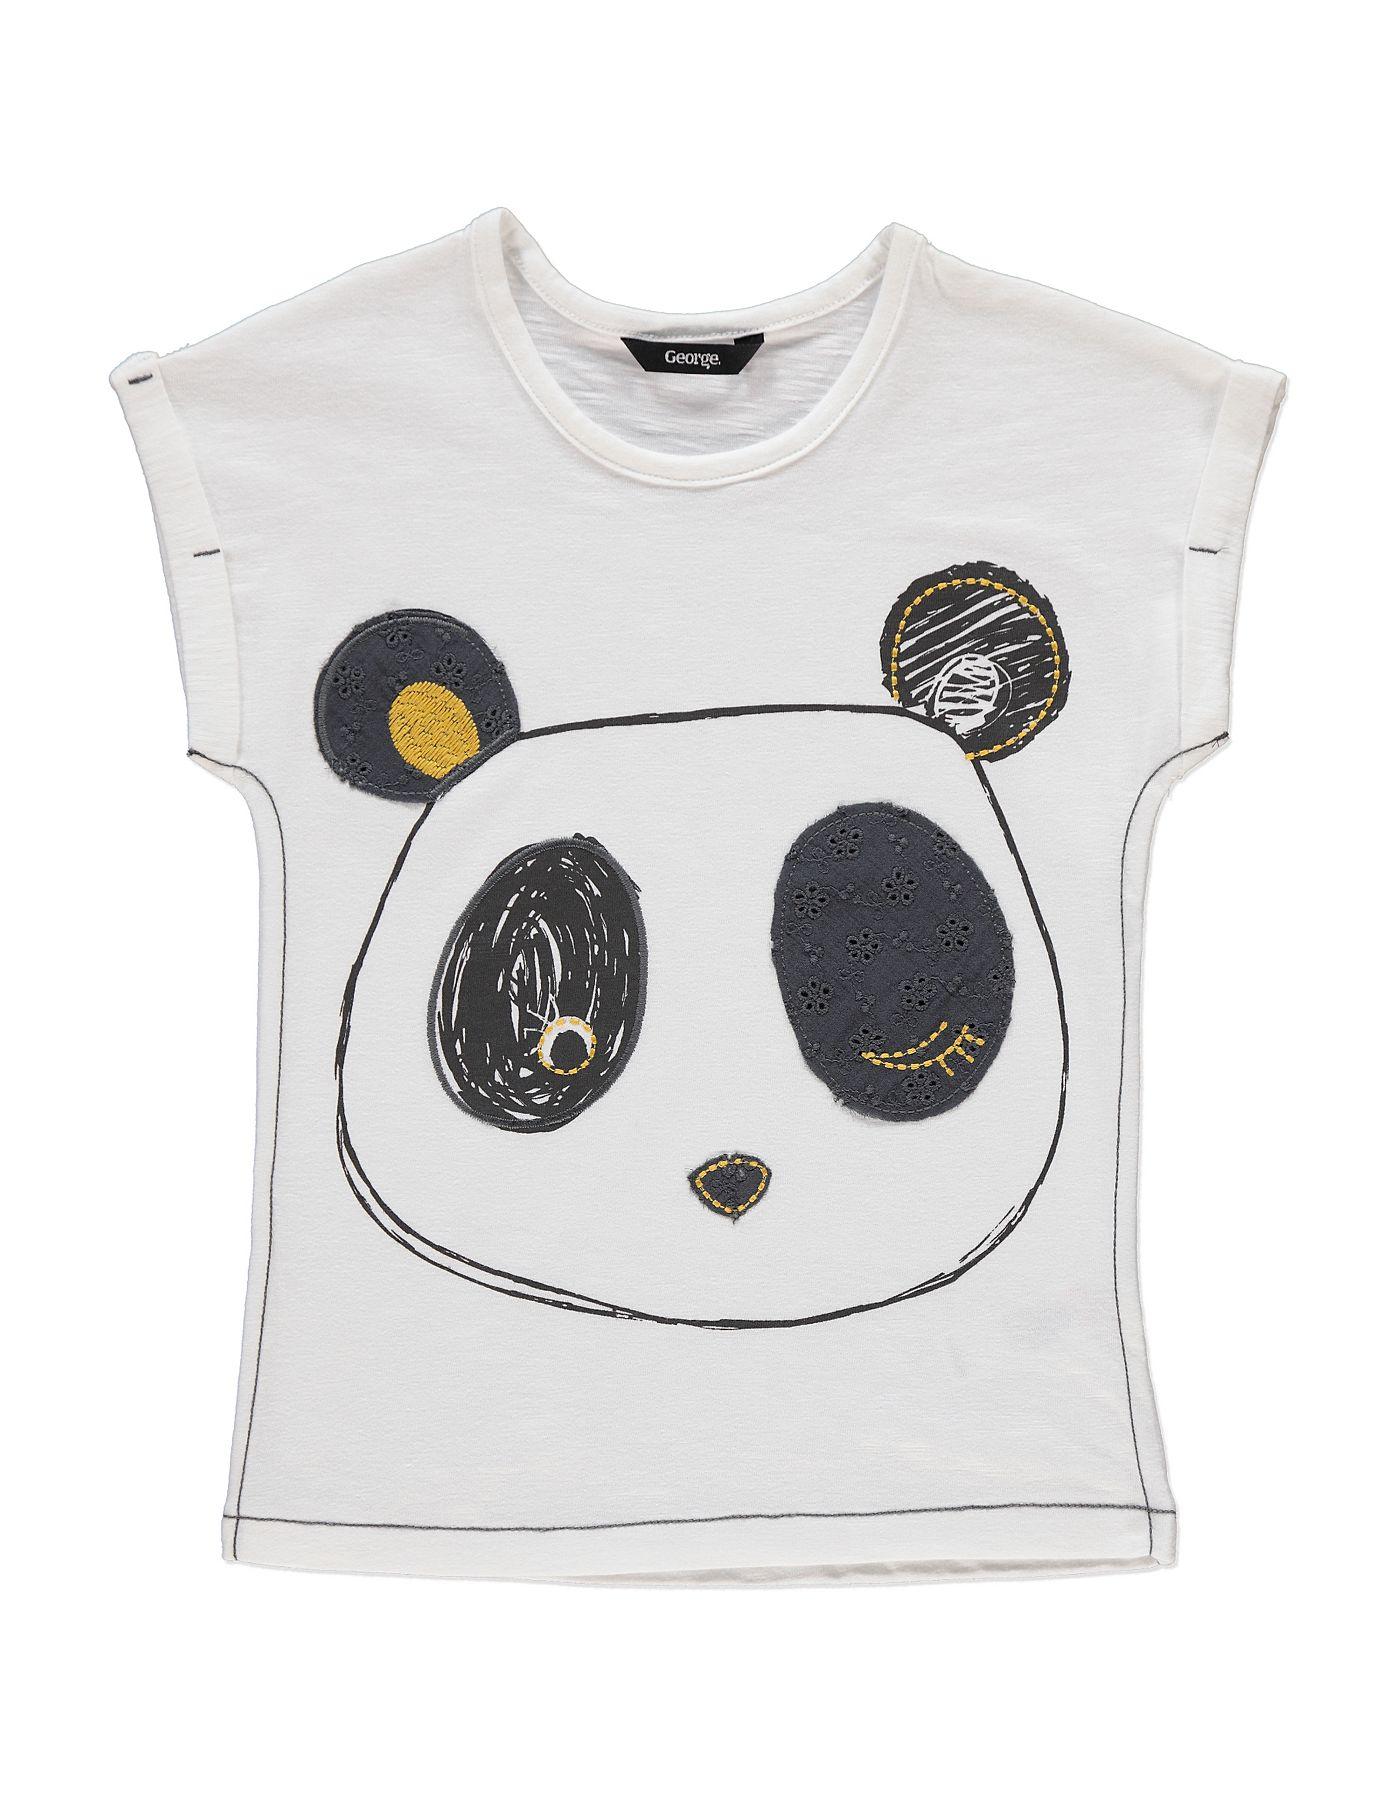 Panda Face T-shirt   blusas decoradas   Ropa para niñas, Ropa y Niños